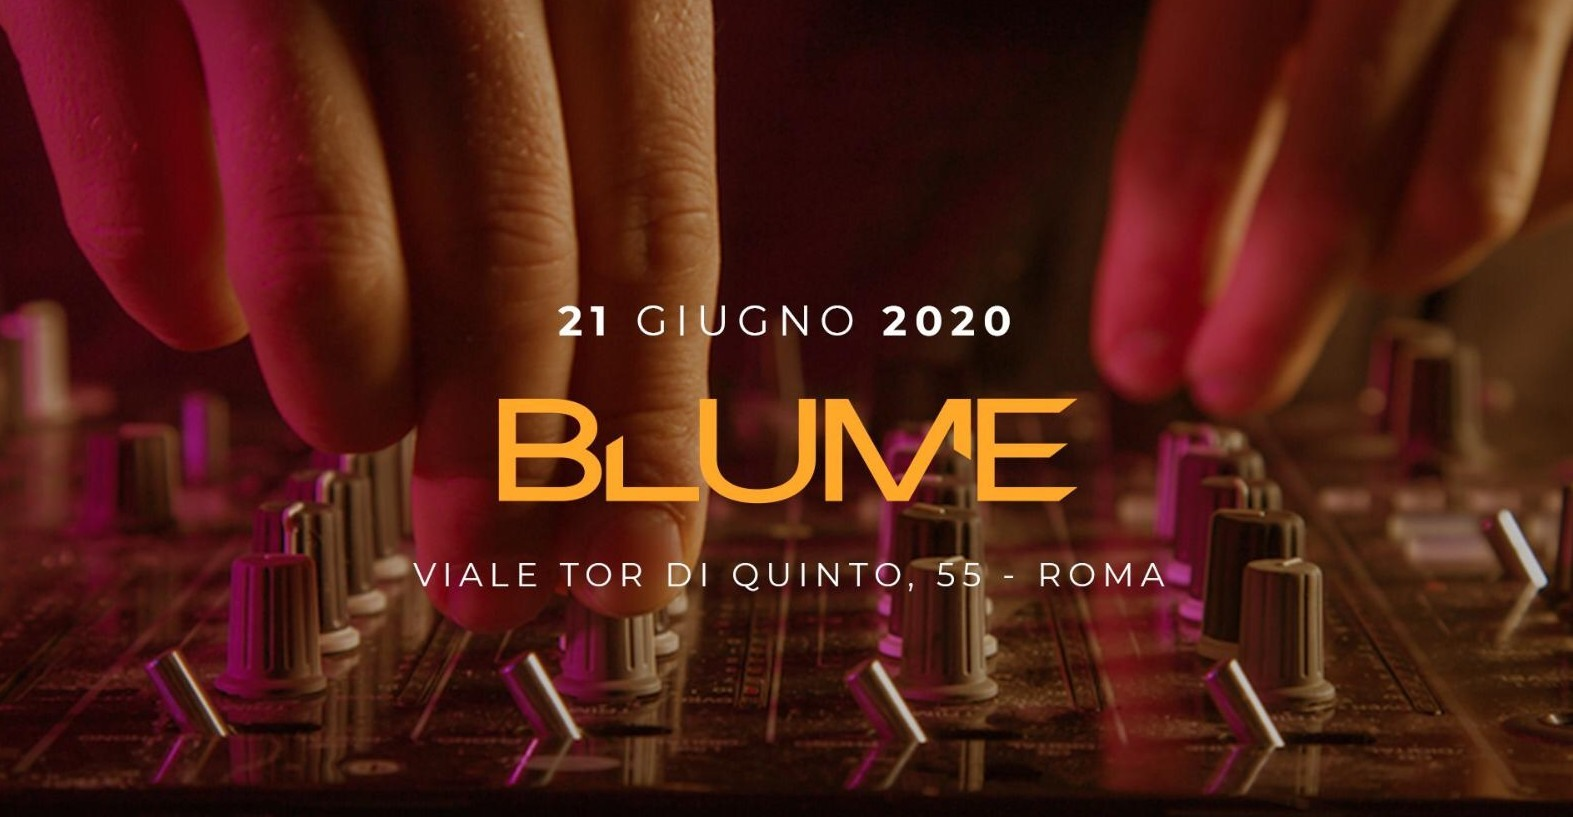 Blume Garden Domenica 21 Giugno 20200 SUNDAY @ Ponte Milvio